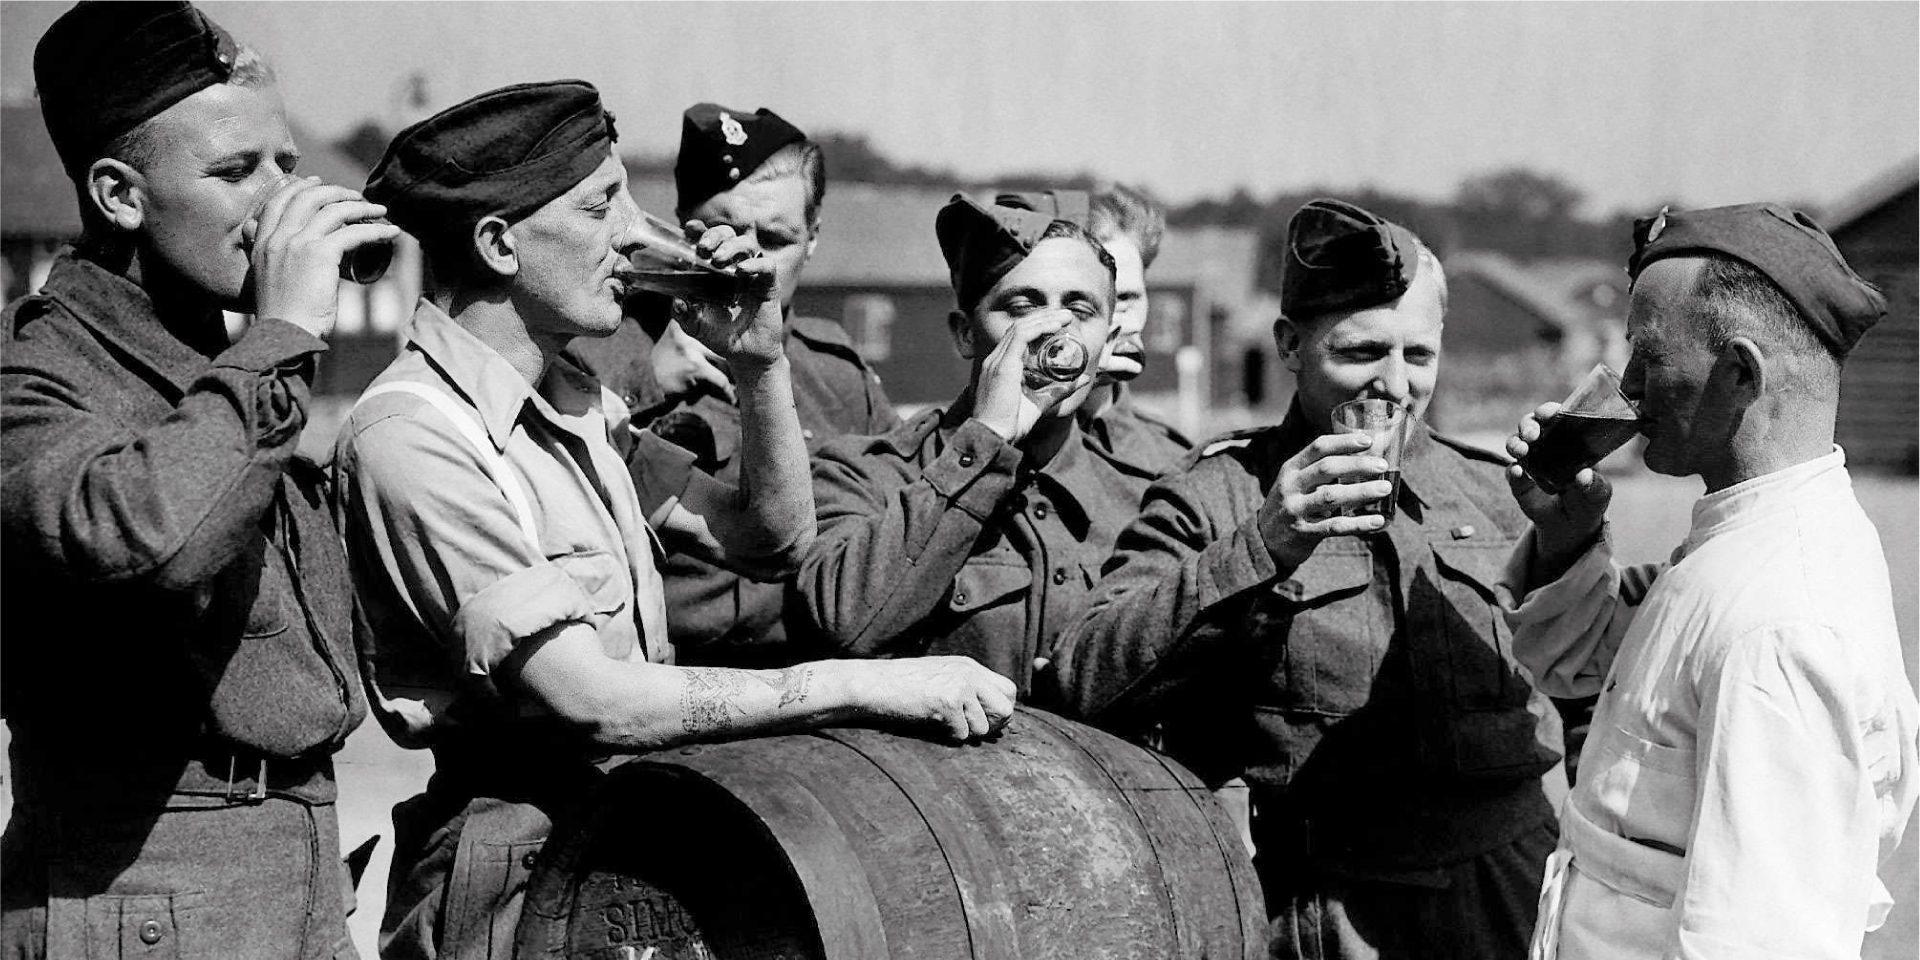 #ForgottenFriday – Cheers! It's International Beer Day